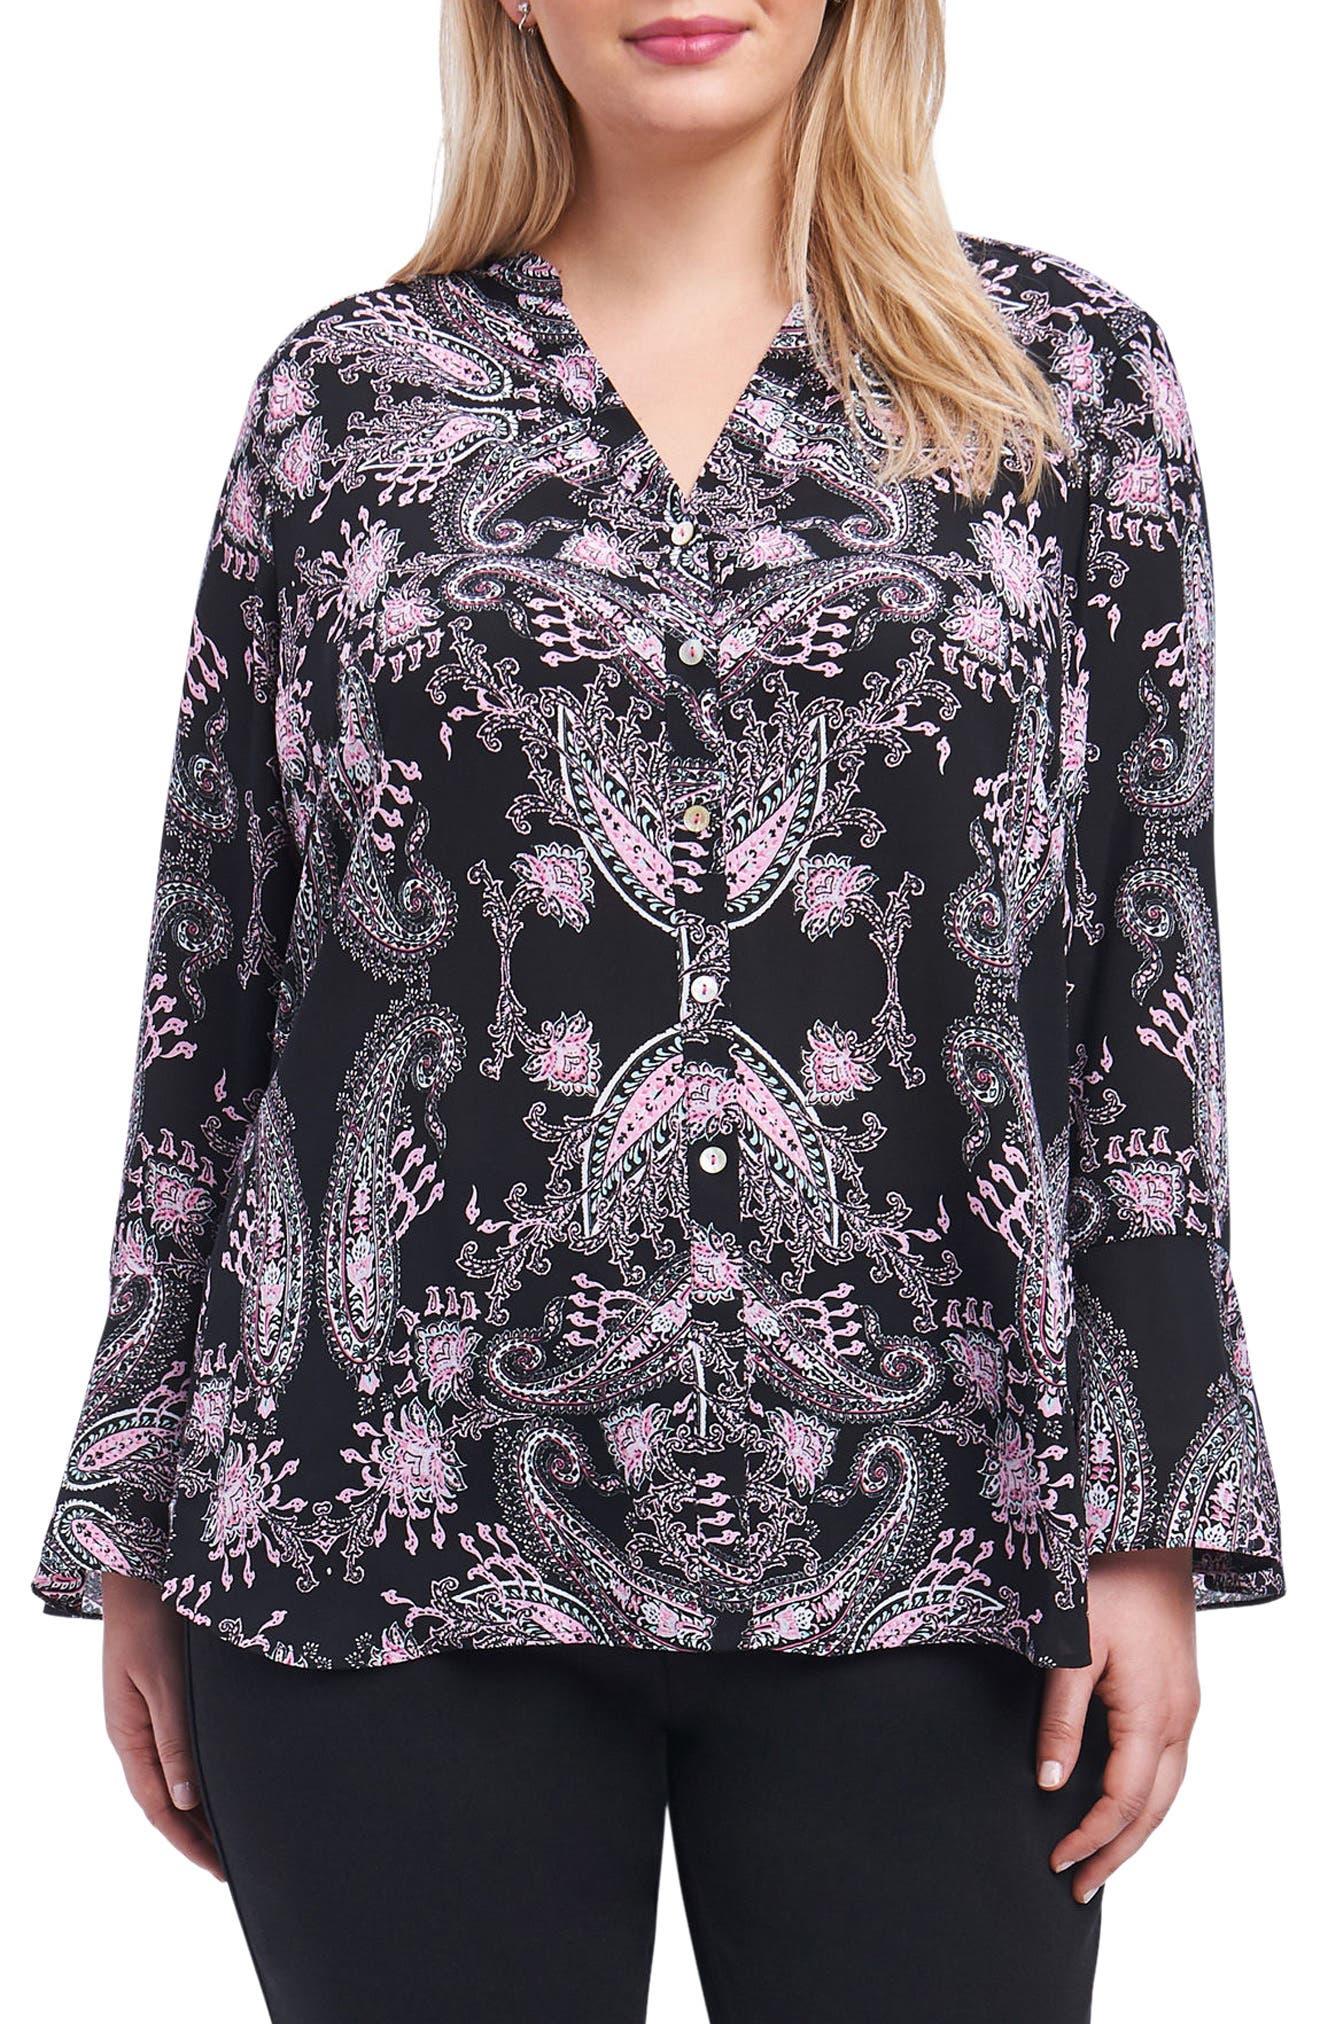 Ali Dolce Vita Bell Sleeve Shirt,                             Main thumbnail 1, color,                             Multi